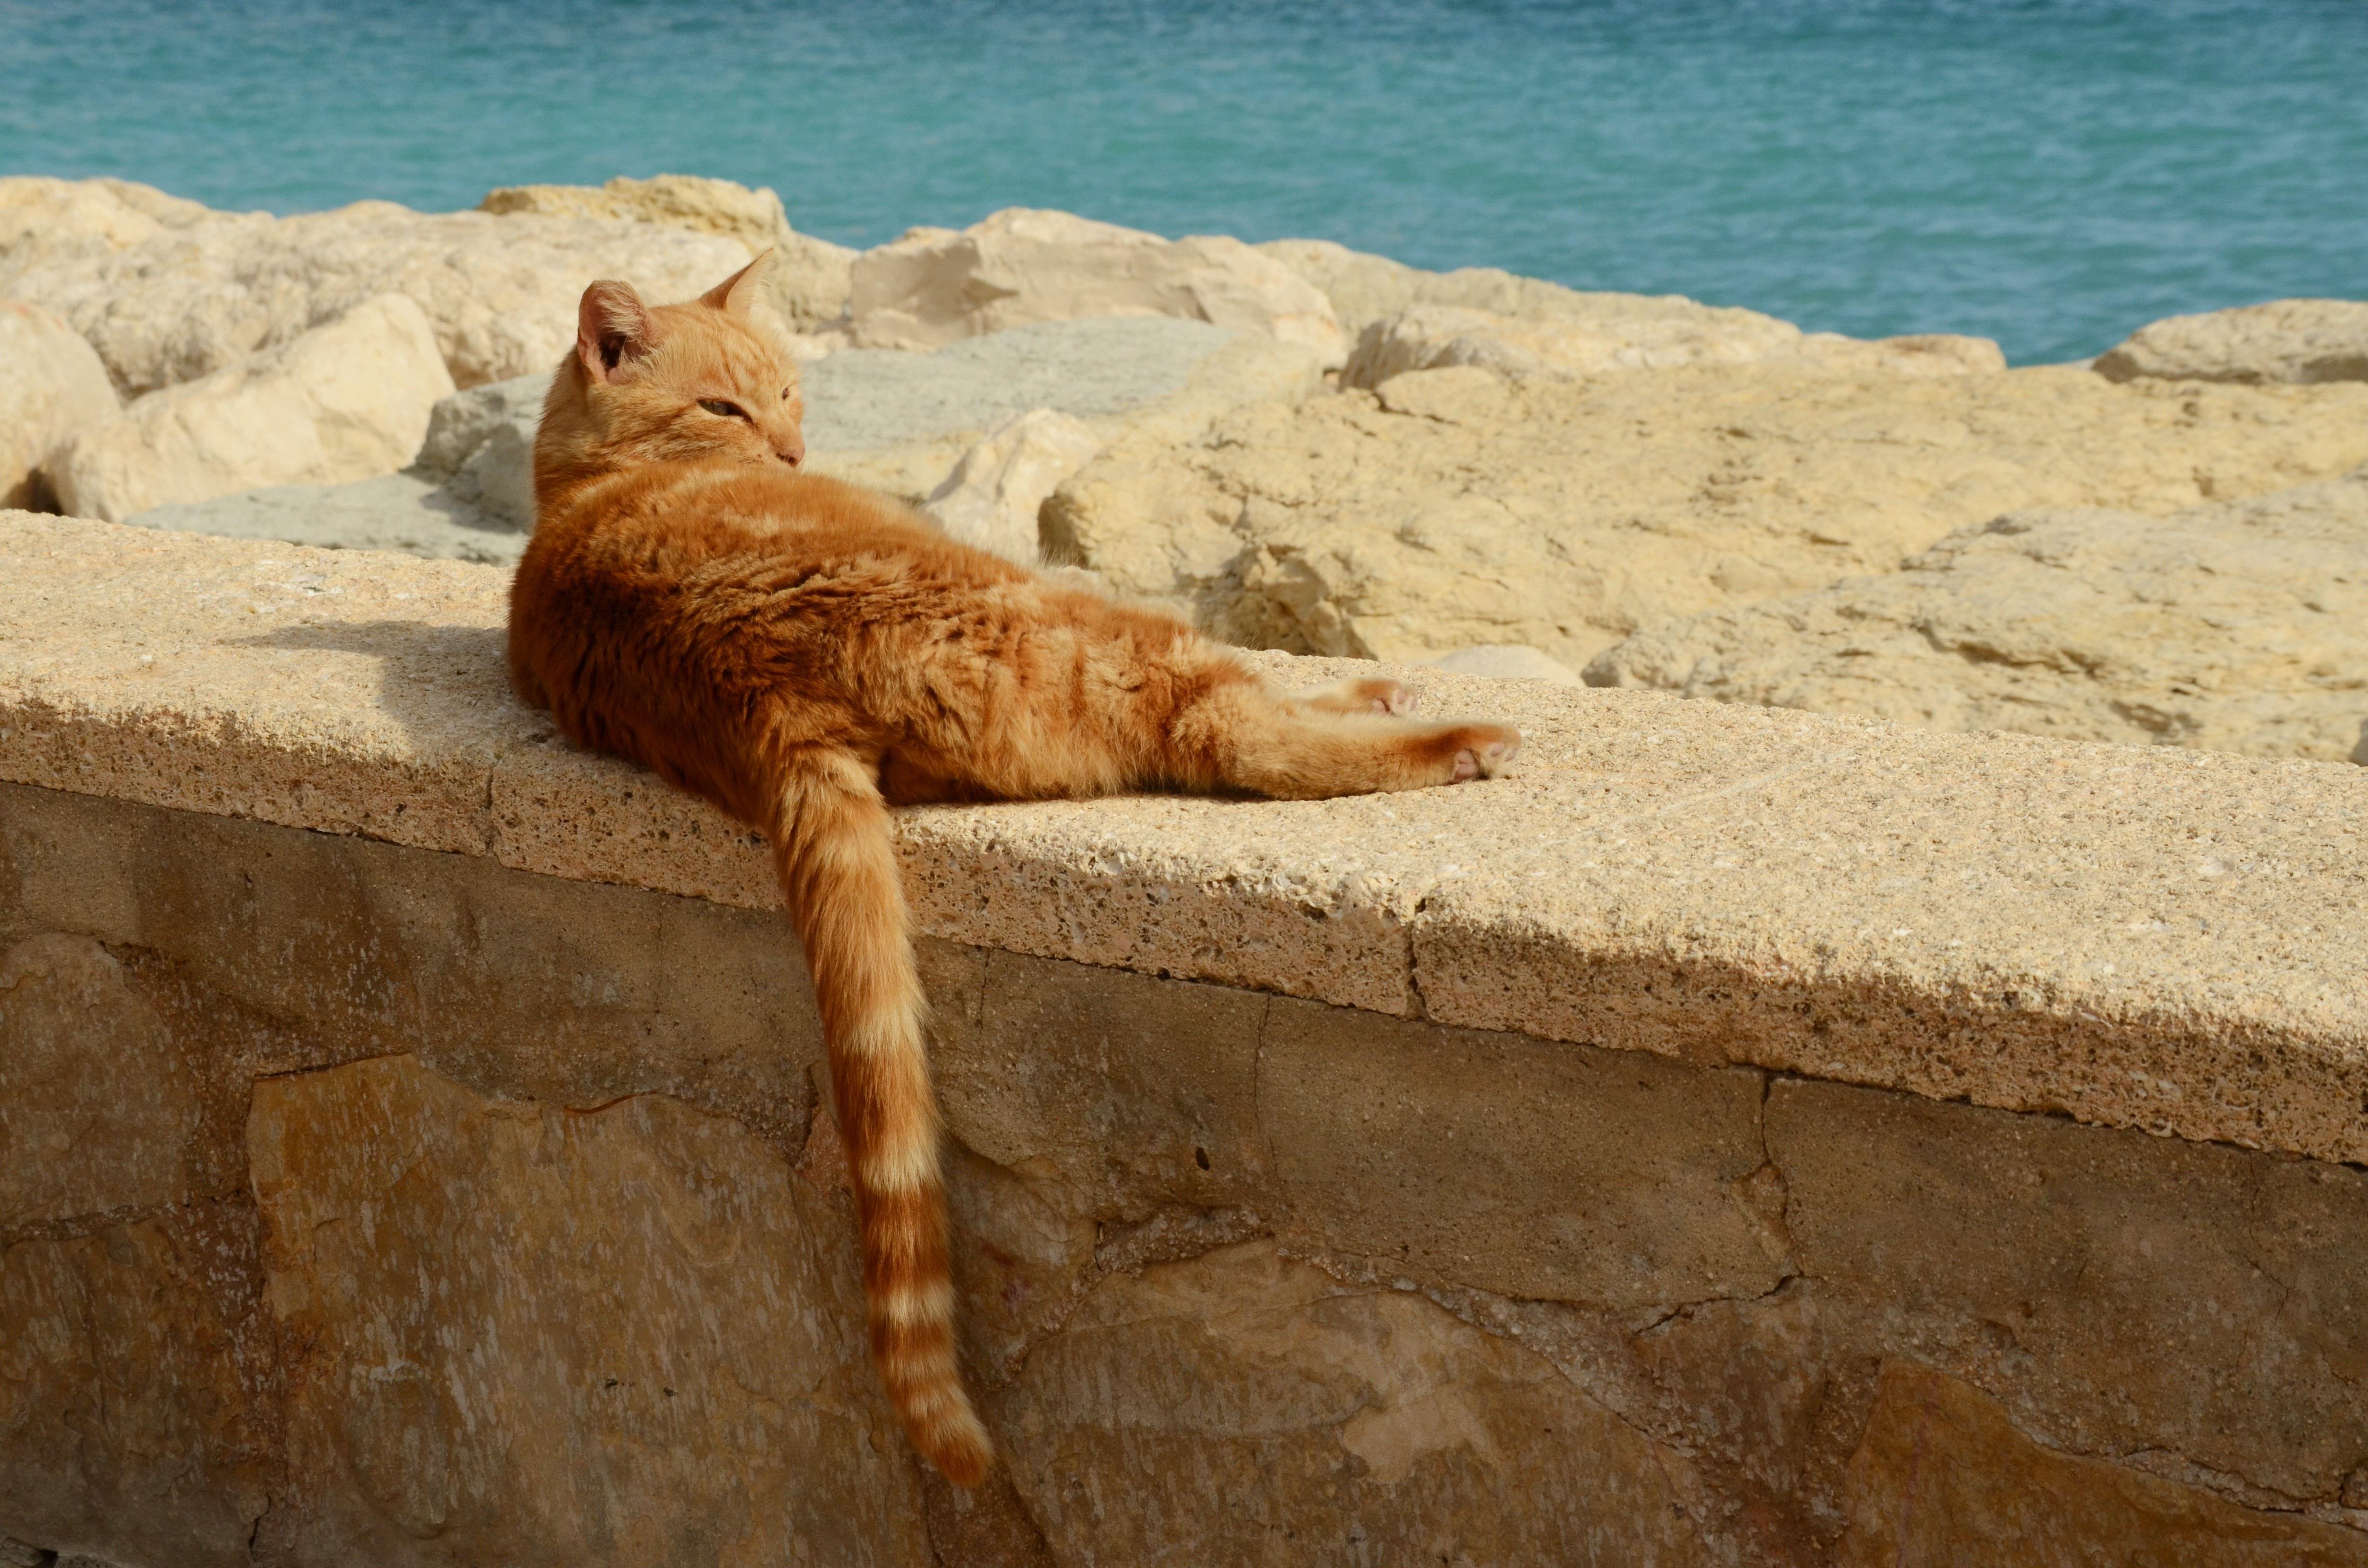 Отдыхающий котик фото